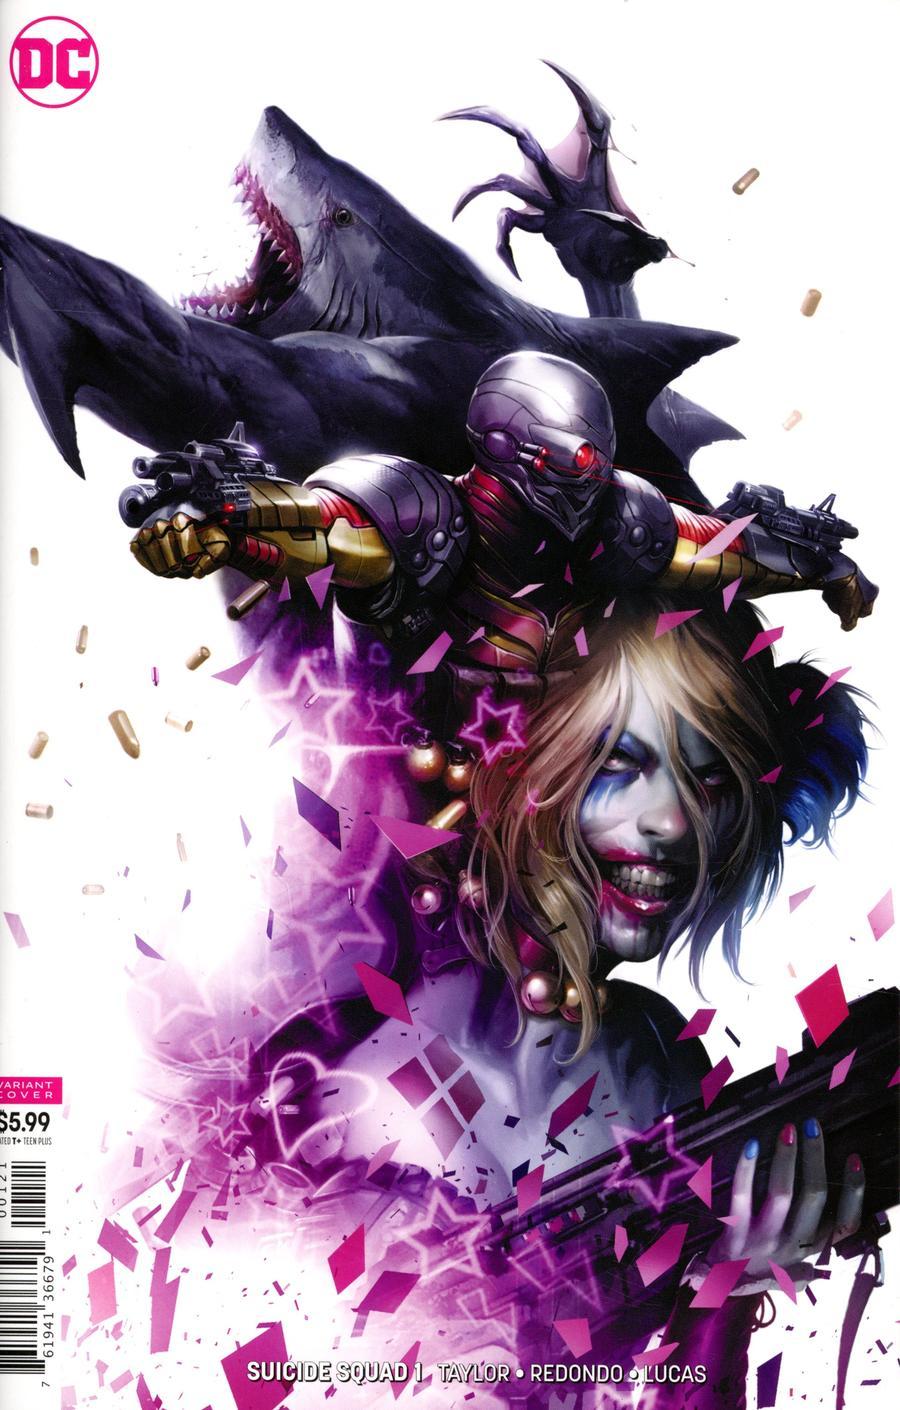 Suicide Squad Vol 5 #1 Cover B Variant Francesco Mattina Card Stock Cover